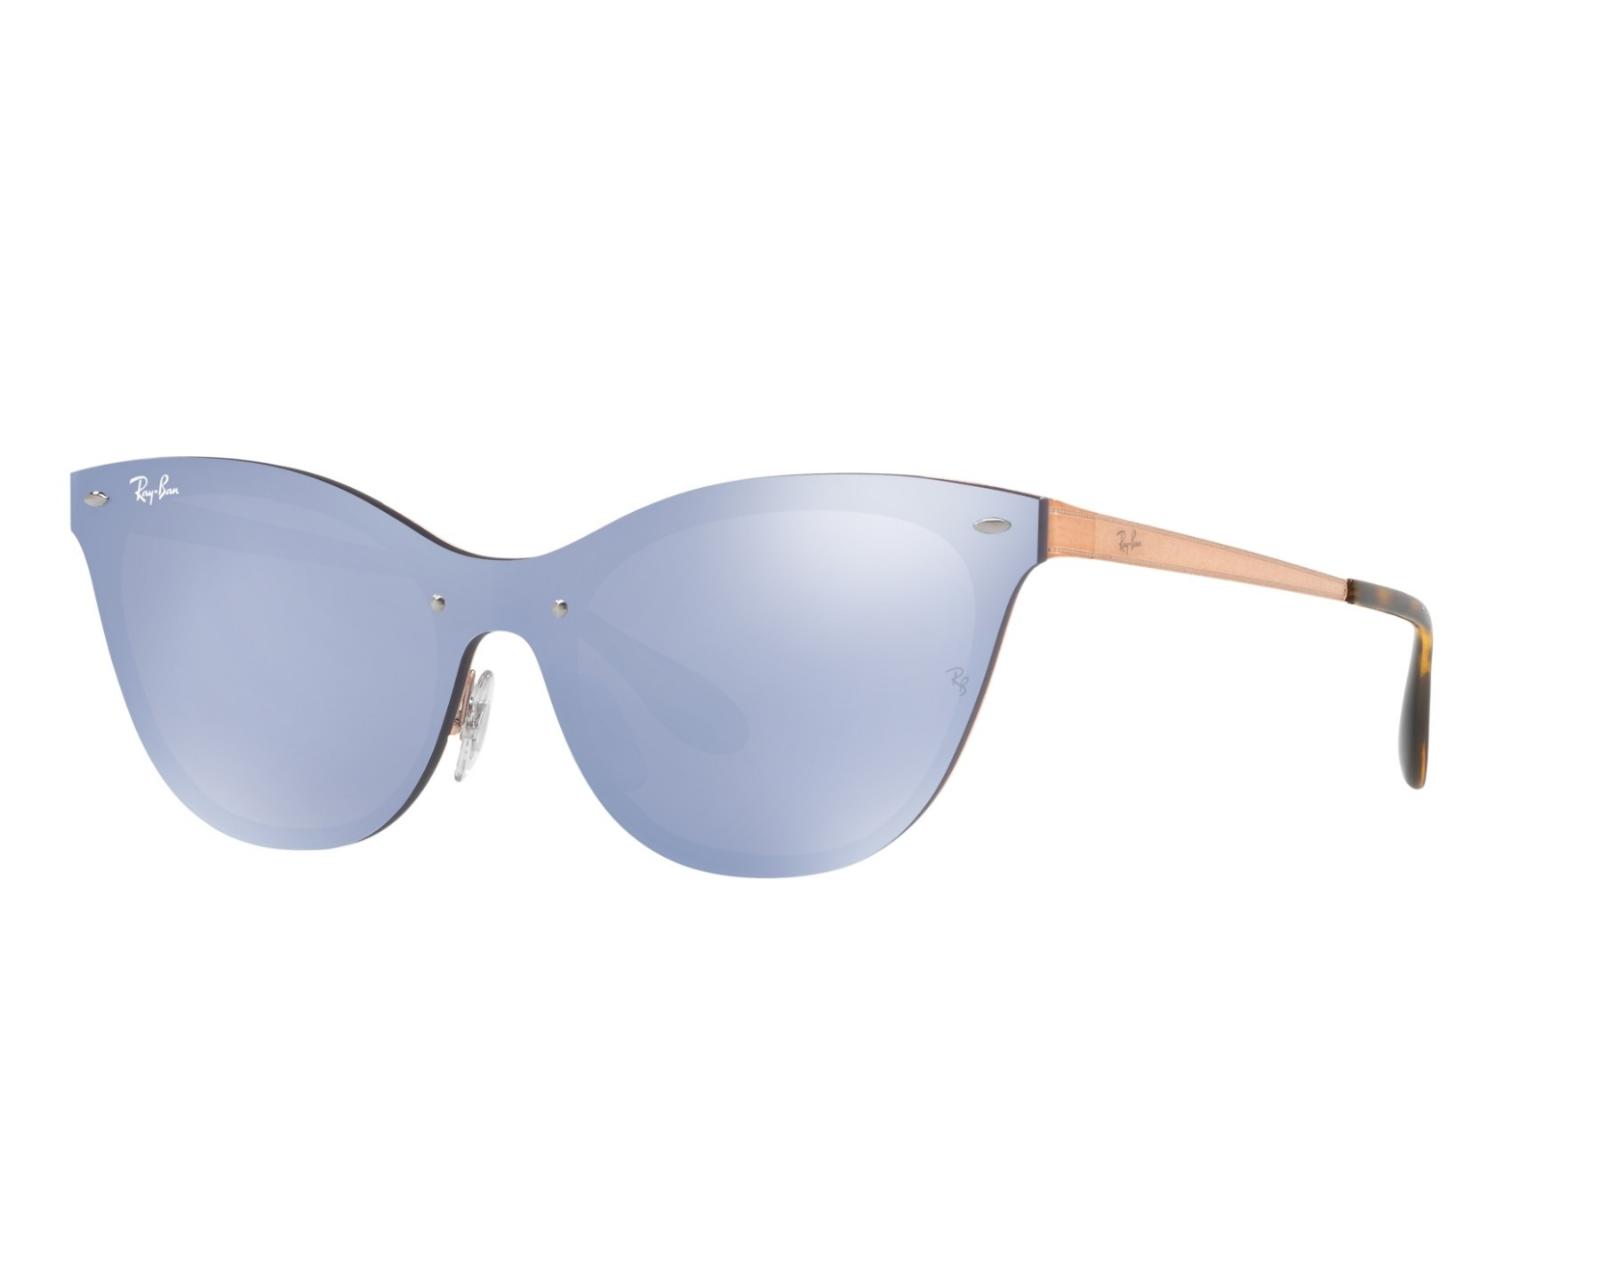 Rayban Cateye Blaze Sunglasses RB3580N 90391U Bronze Violet Mirror New 43mm